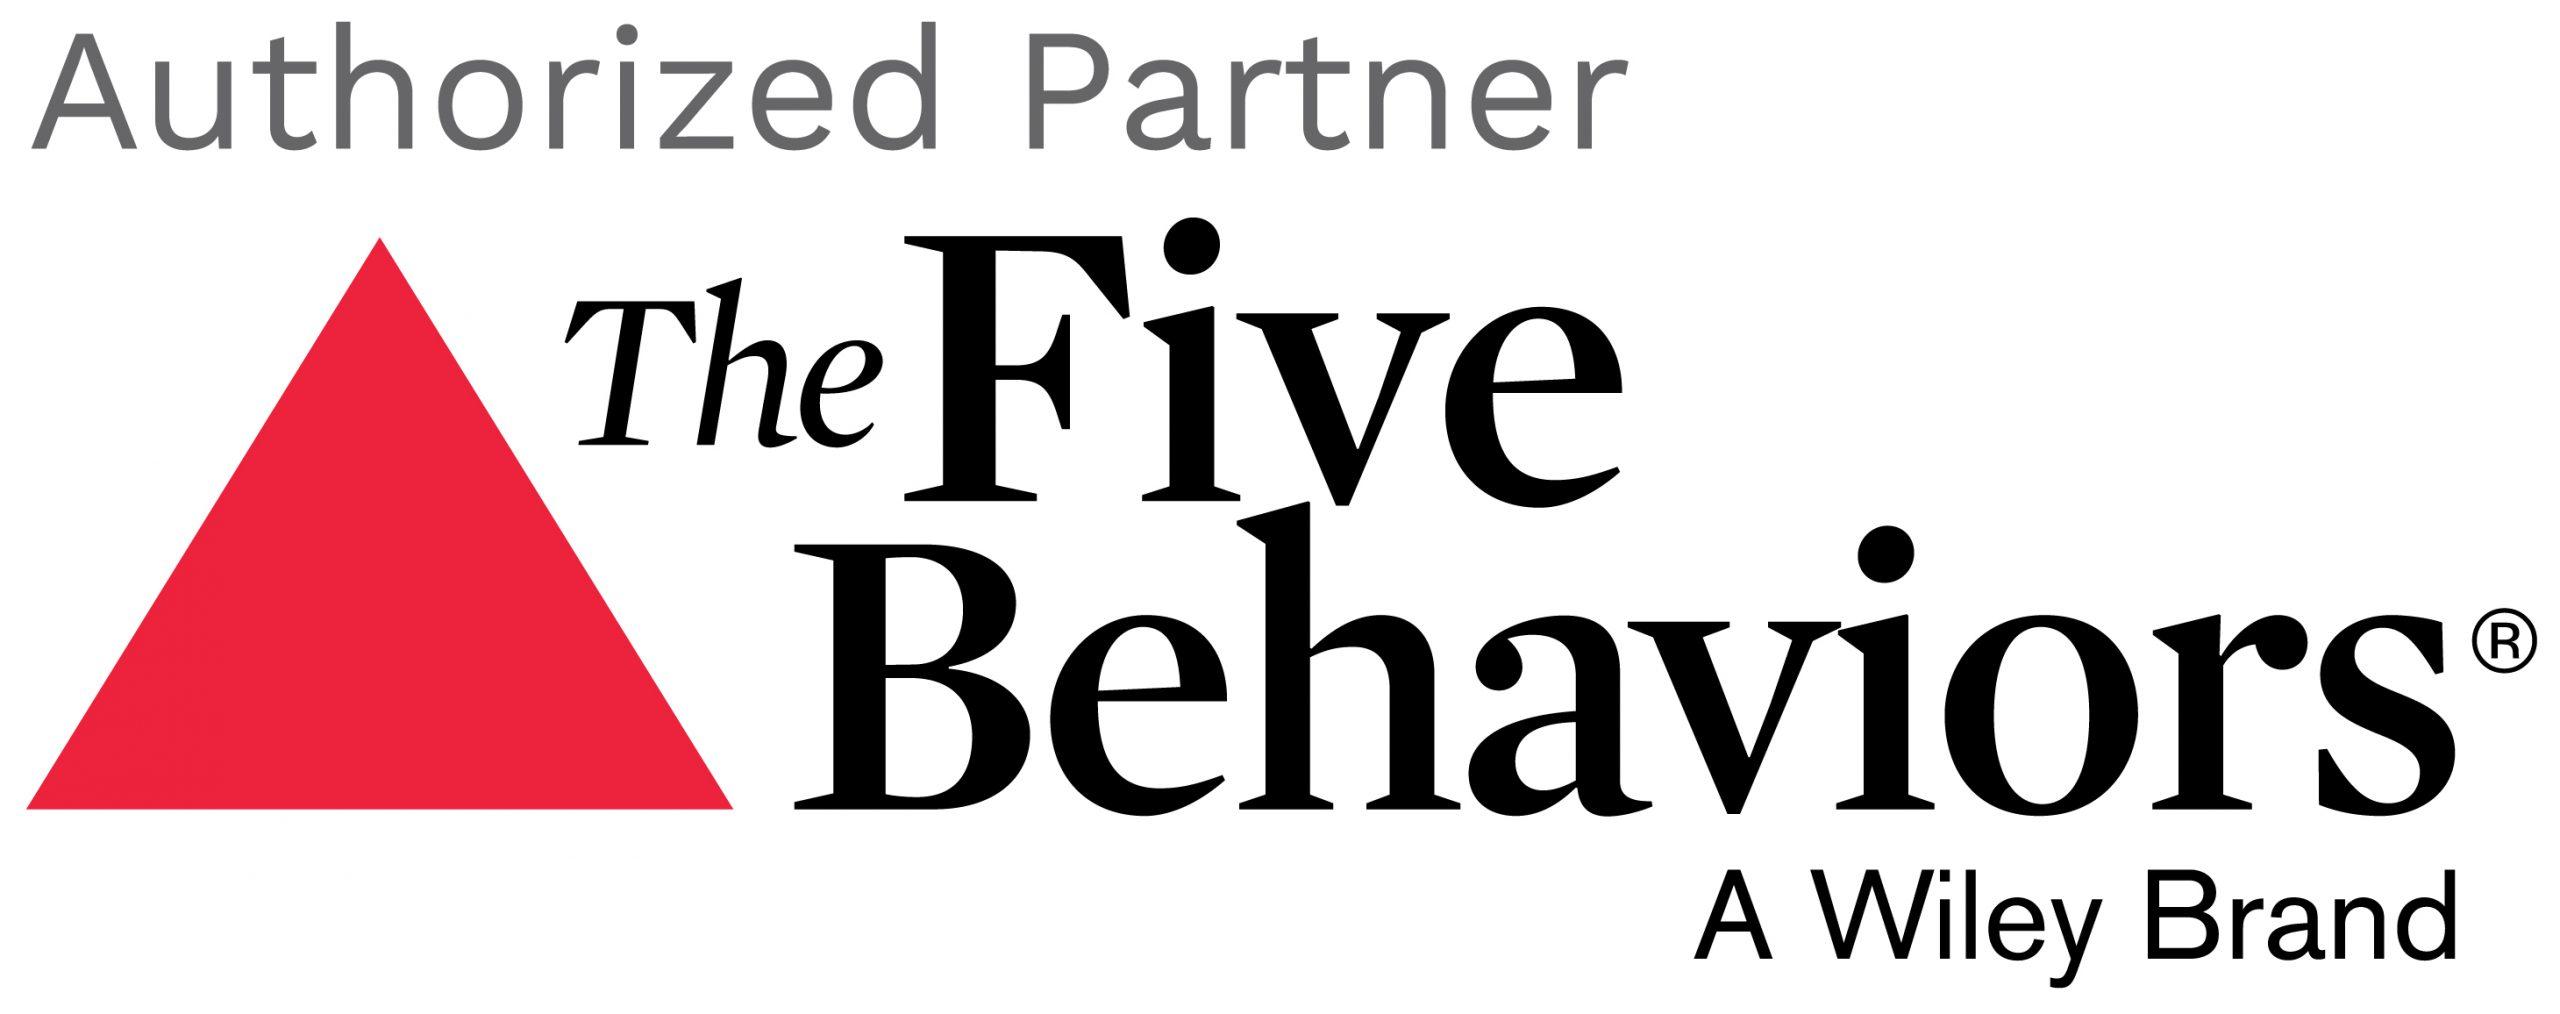 Five Behaviors Authorized Partner.